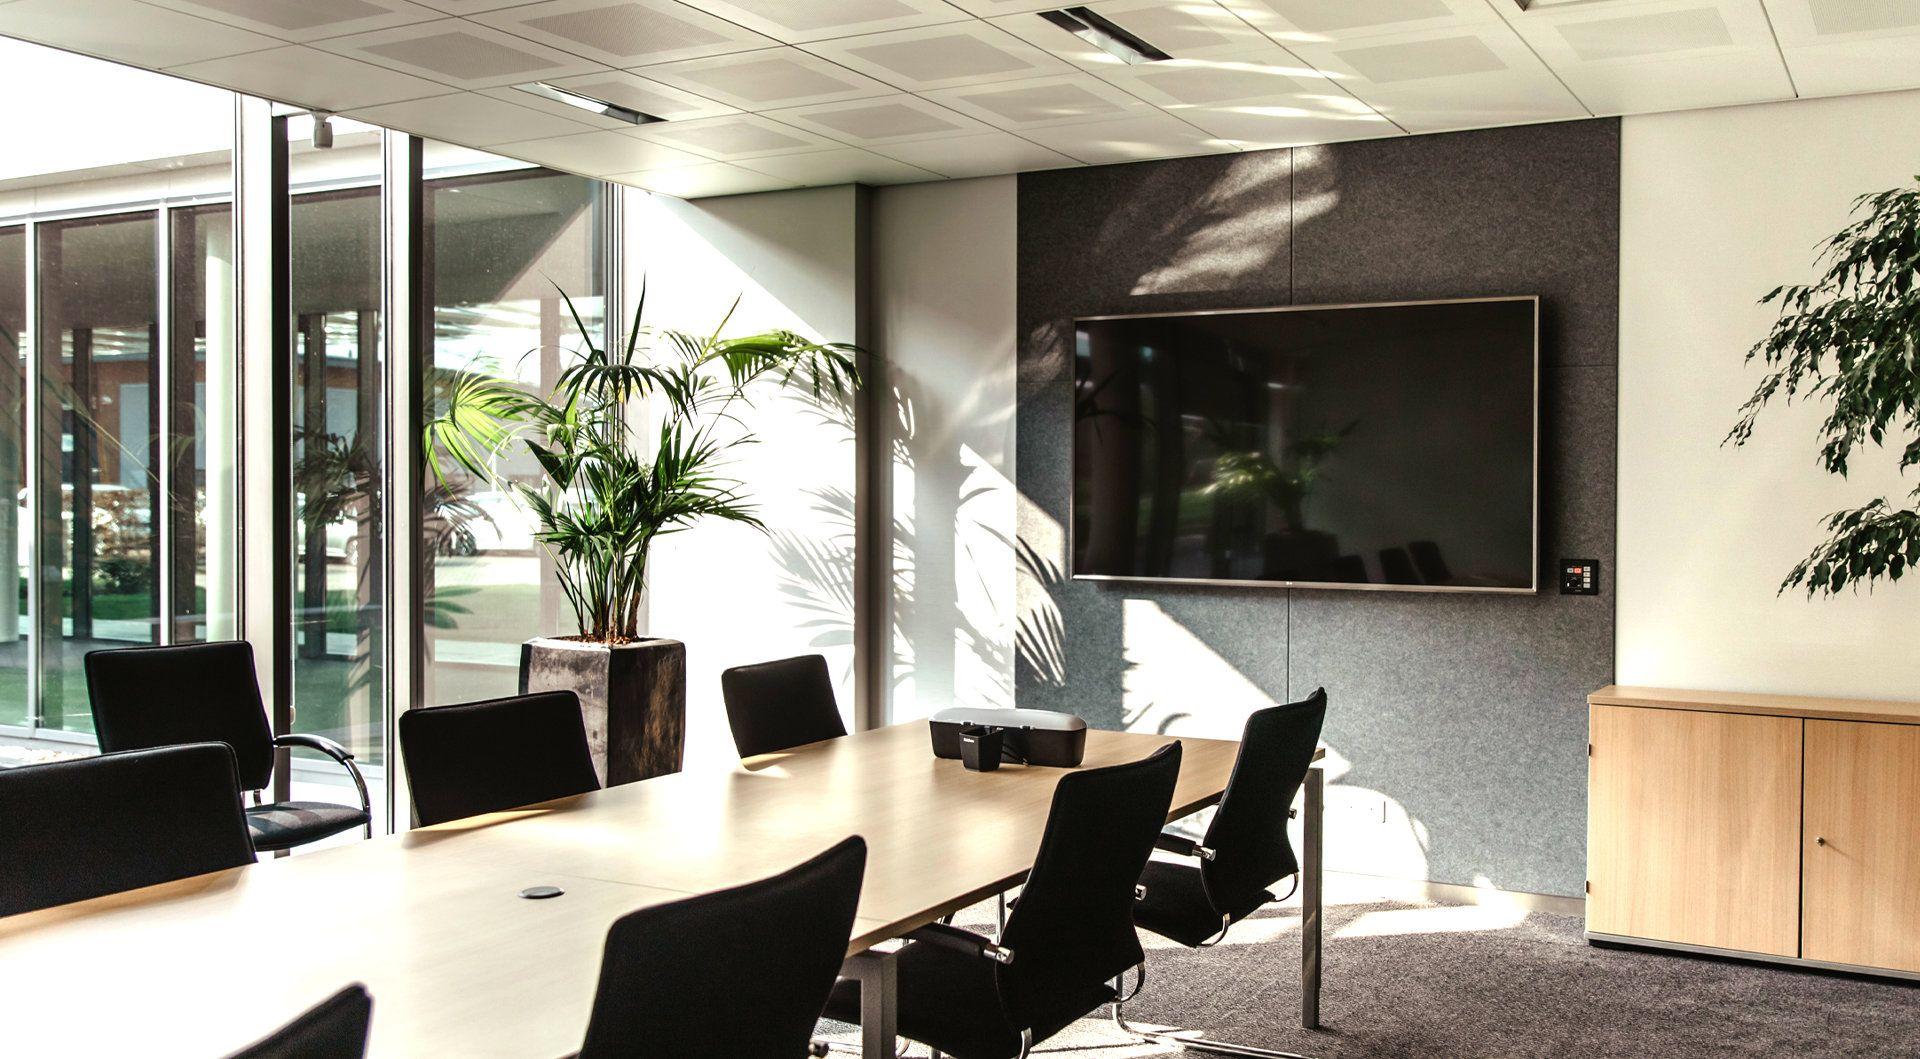 "LG 86BH5C beeldkrant 2,18 m (86"") LED Digitale signage flatscreen Zwart - Case studie de vries"